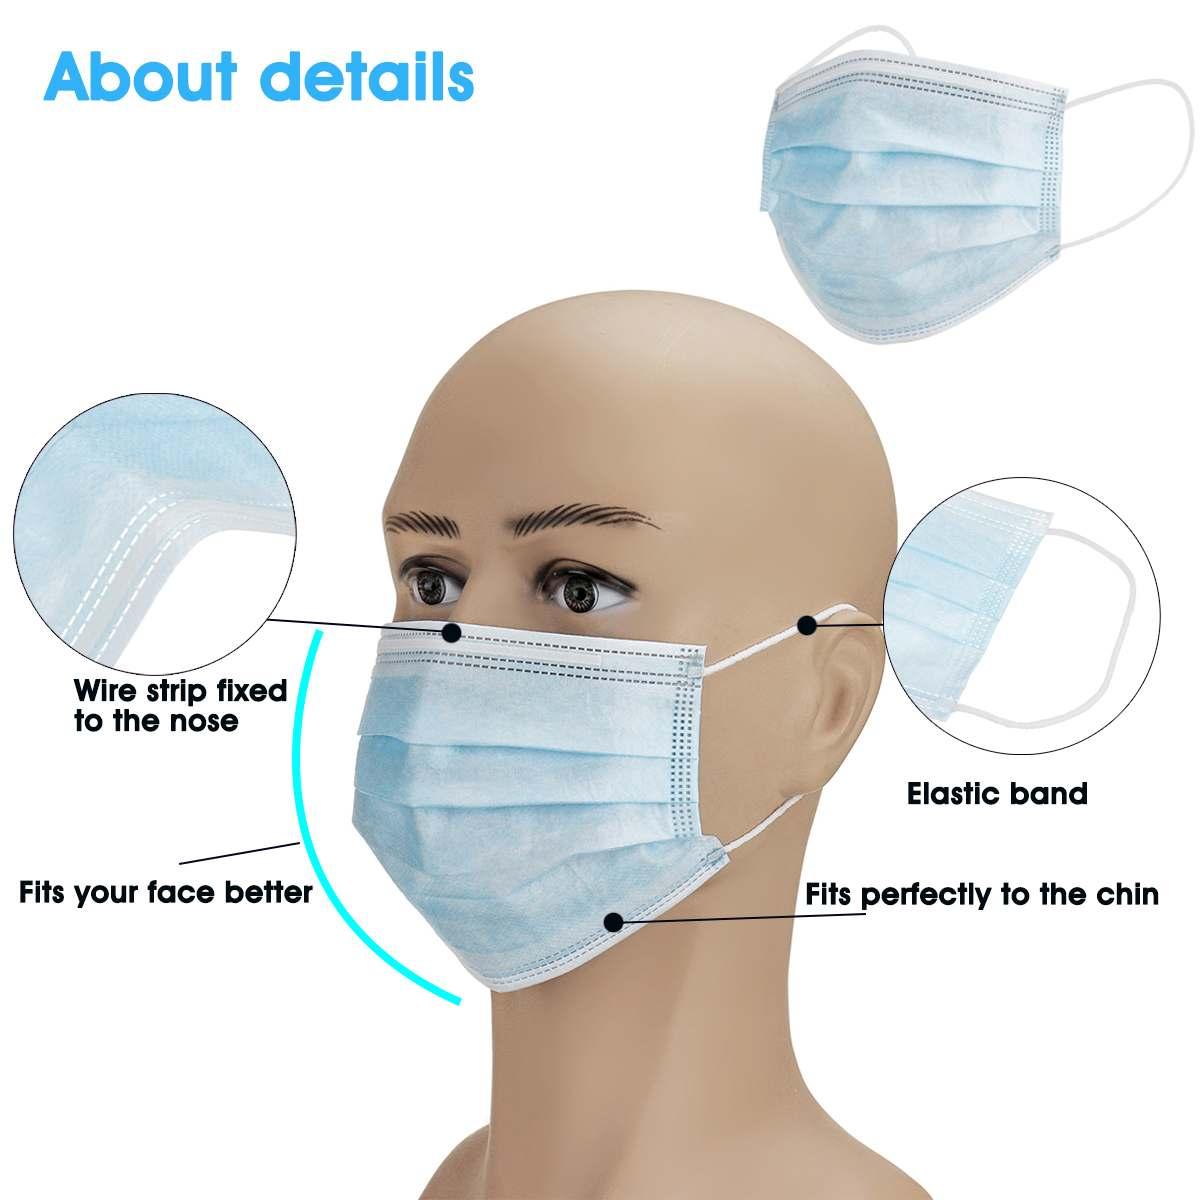 50/100/150pcs Disposable Antibacterial Mask 3-layers Anti Virus Bacteria Proof Mask Face Antibacterial Anti-Pollution Masks 1